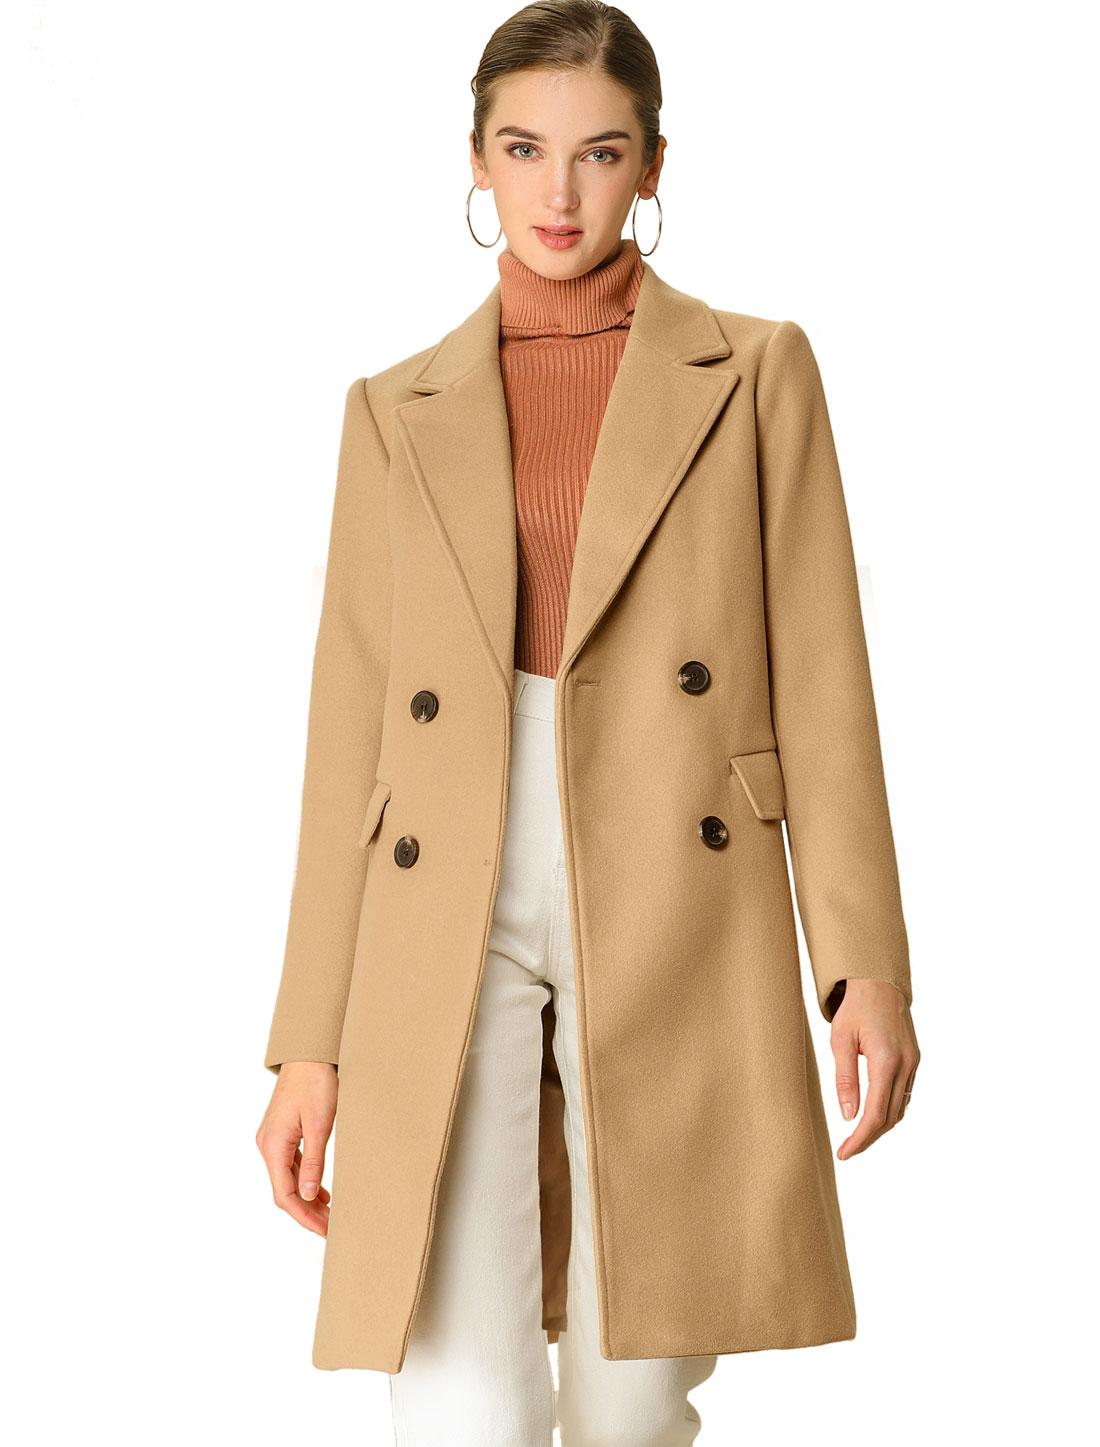 Allegra K Women's button Belt Long Jacket PeaTrench Coat Khaki XS (US 2)